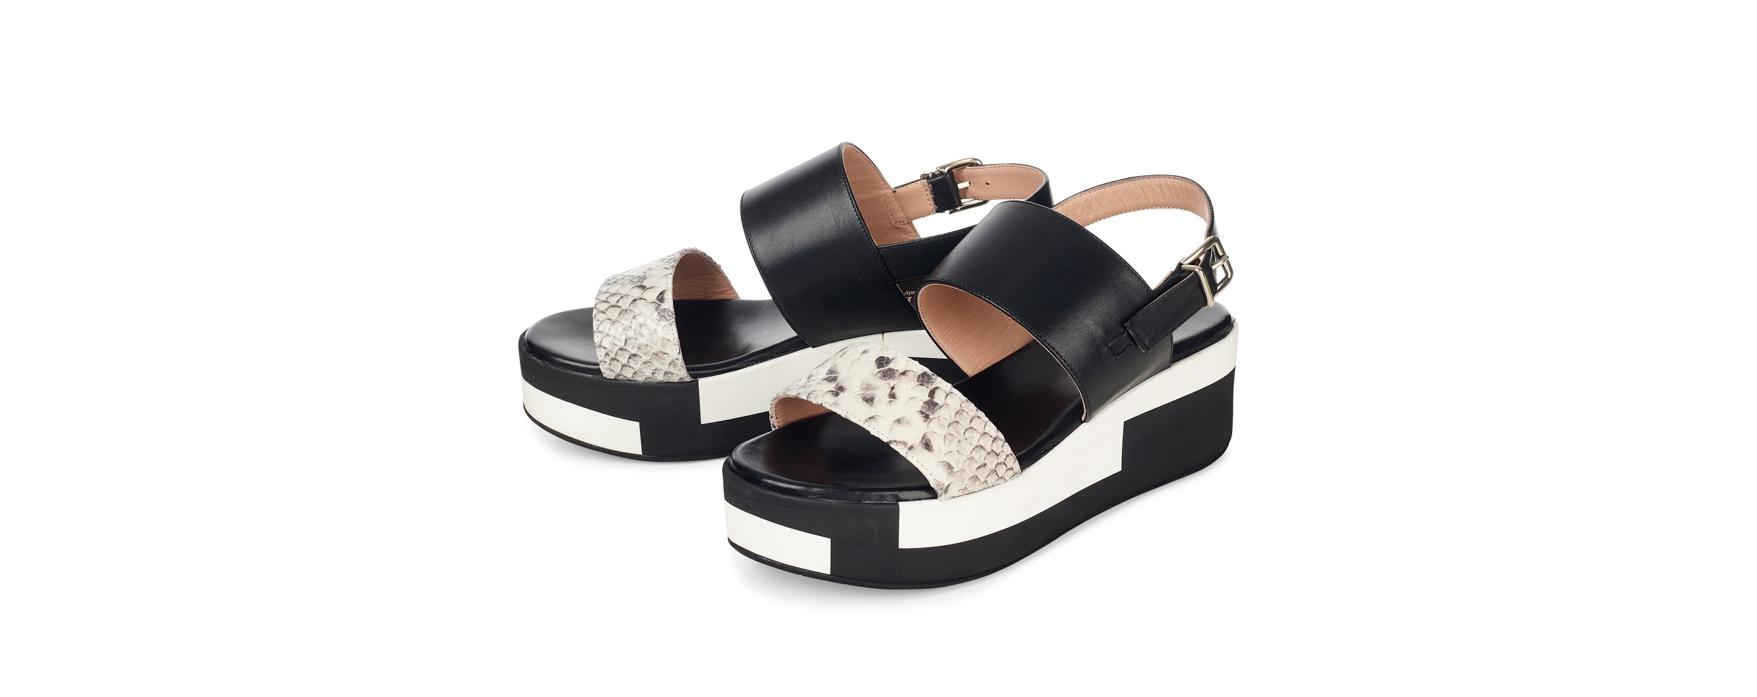 4_62-wedge-sandals.jpg